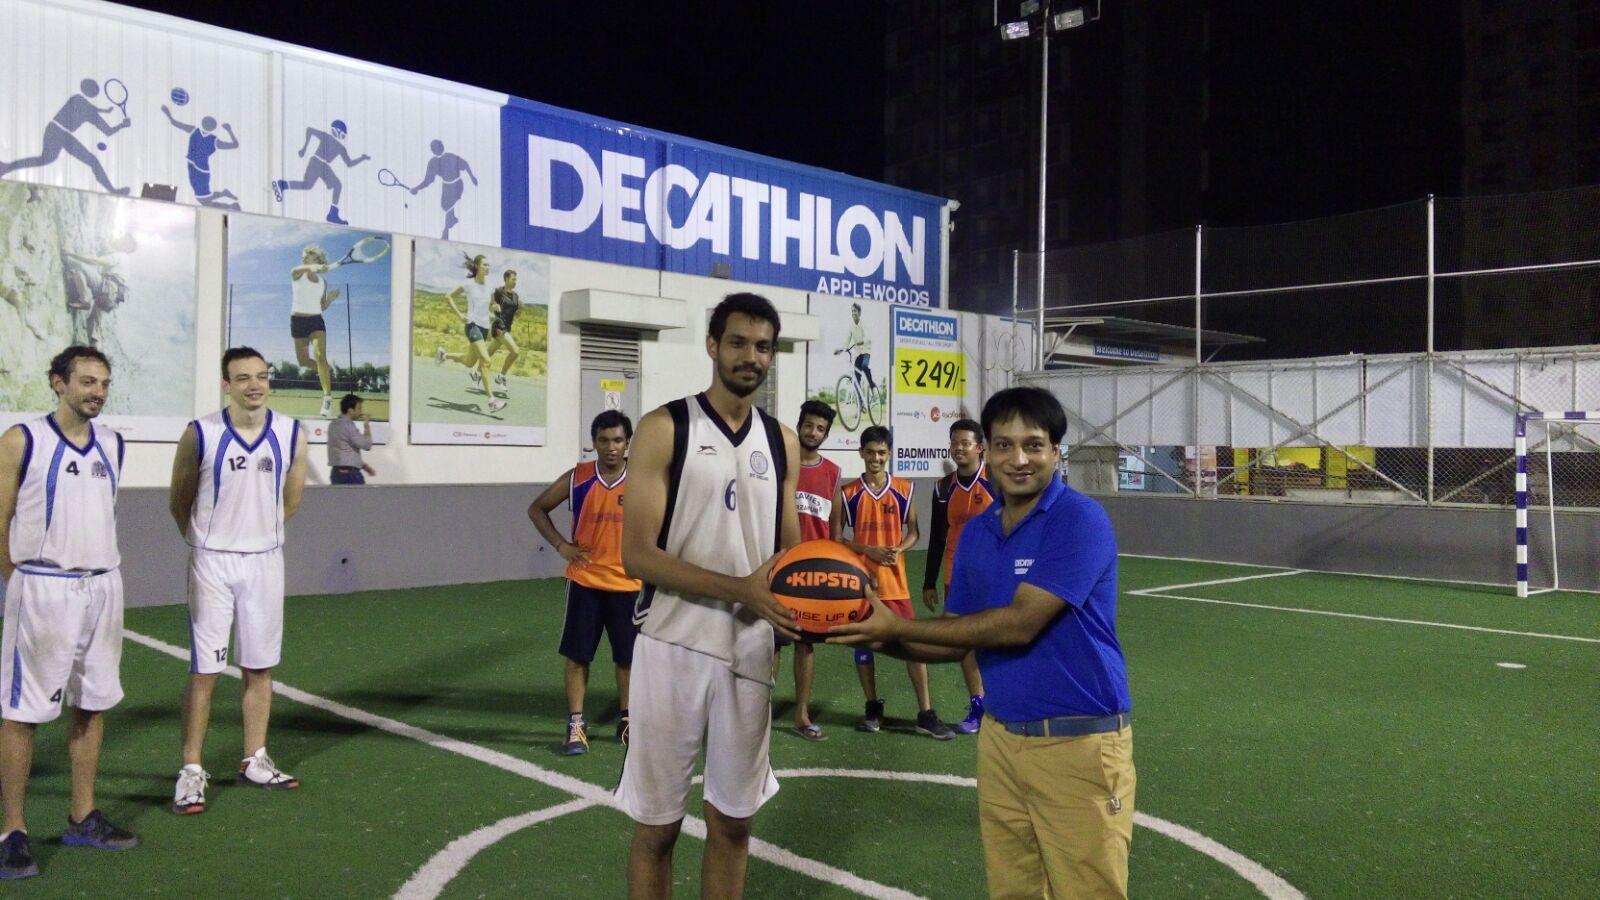 Decathlon turns 2!